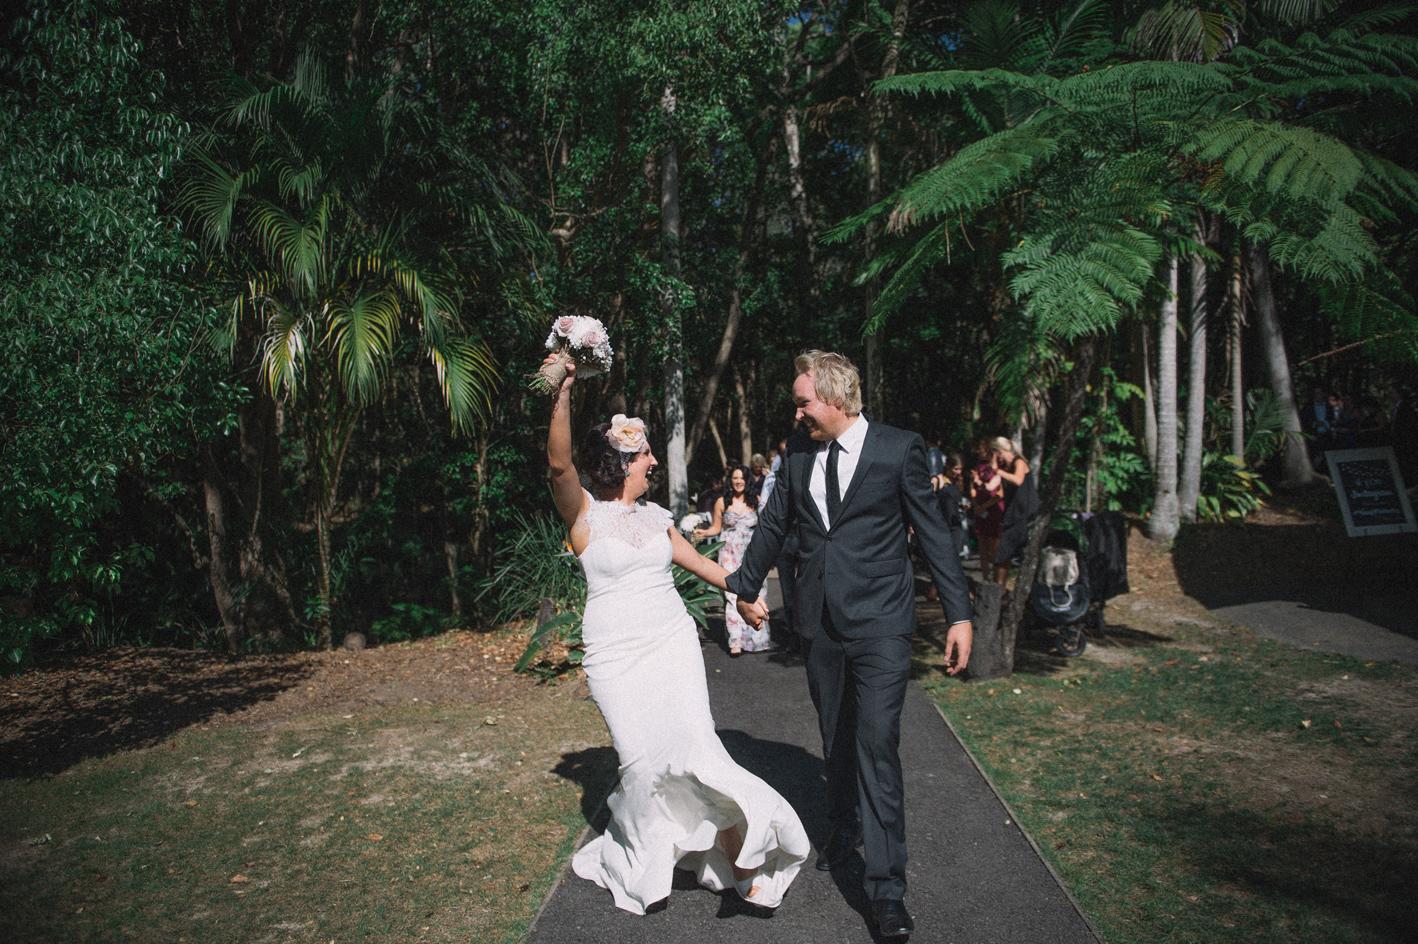 040-hannah-daniel-boomerang-farm-wedding-sophie-baker-photography